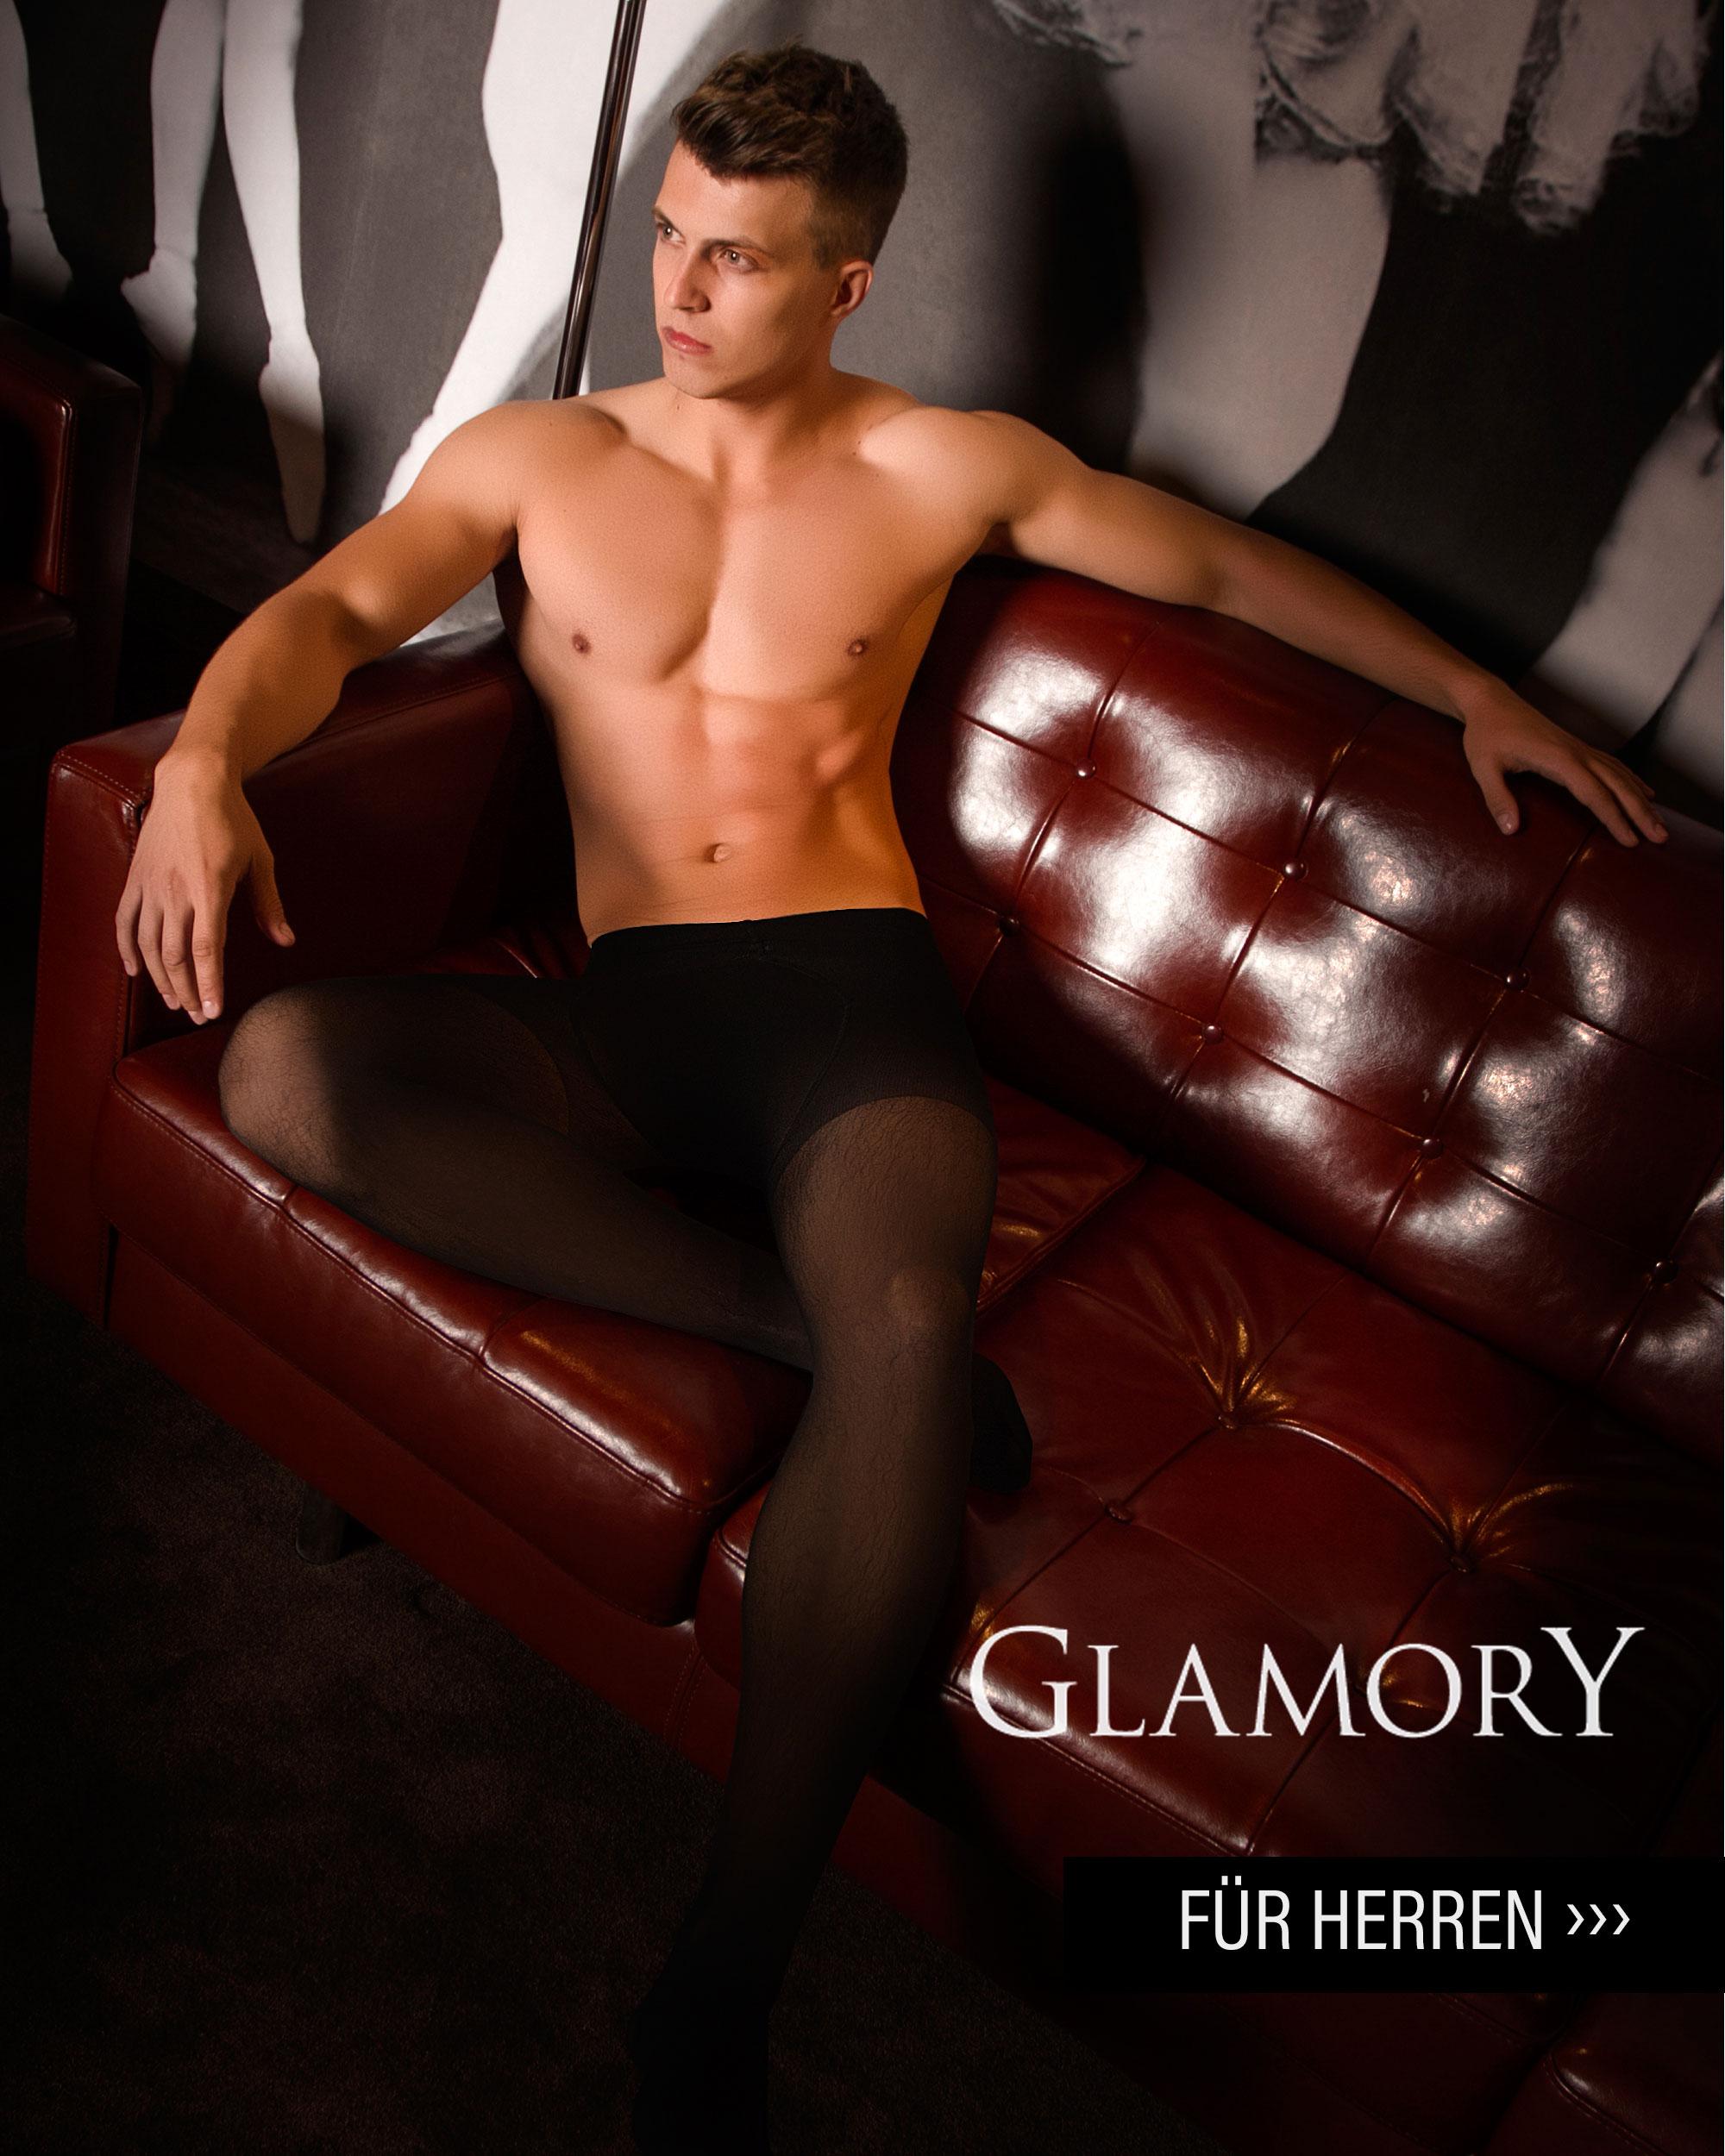 Glamory Strumpfmode für Männer